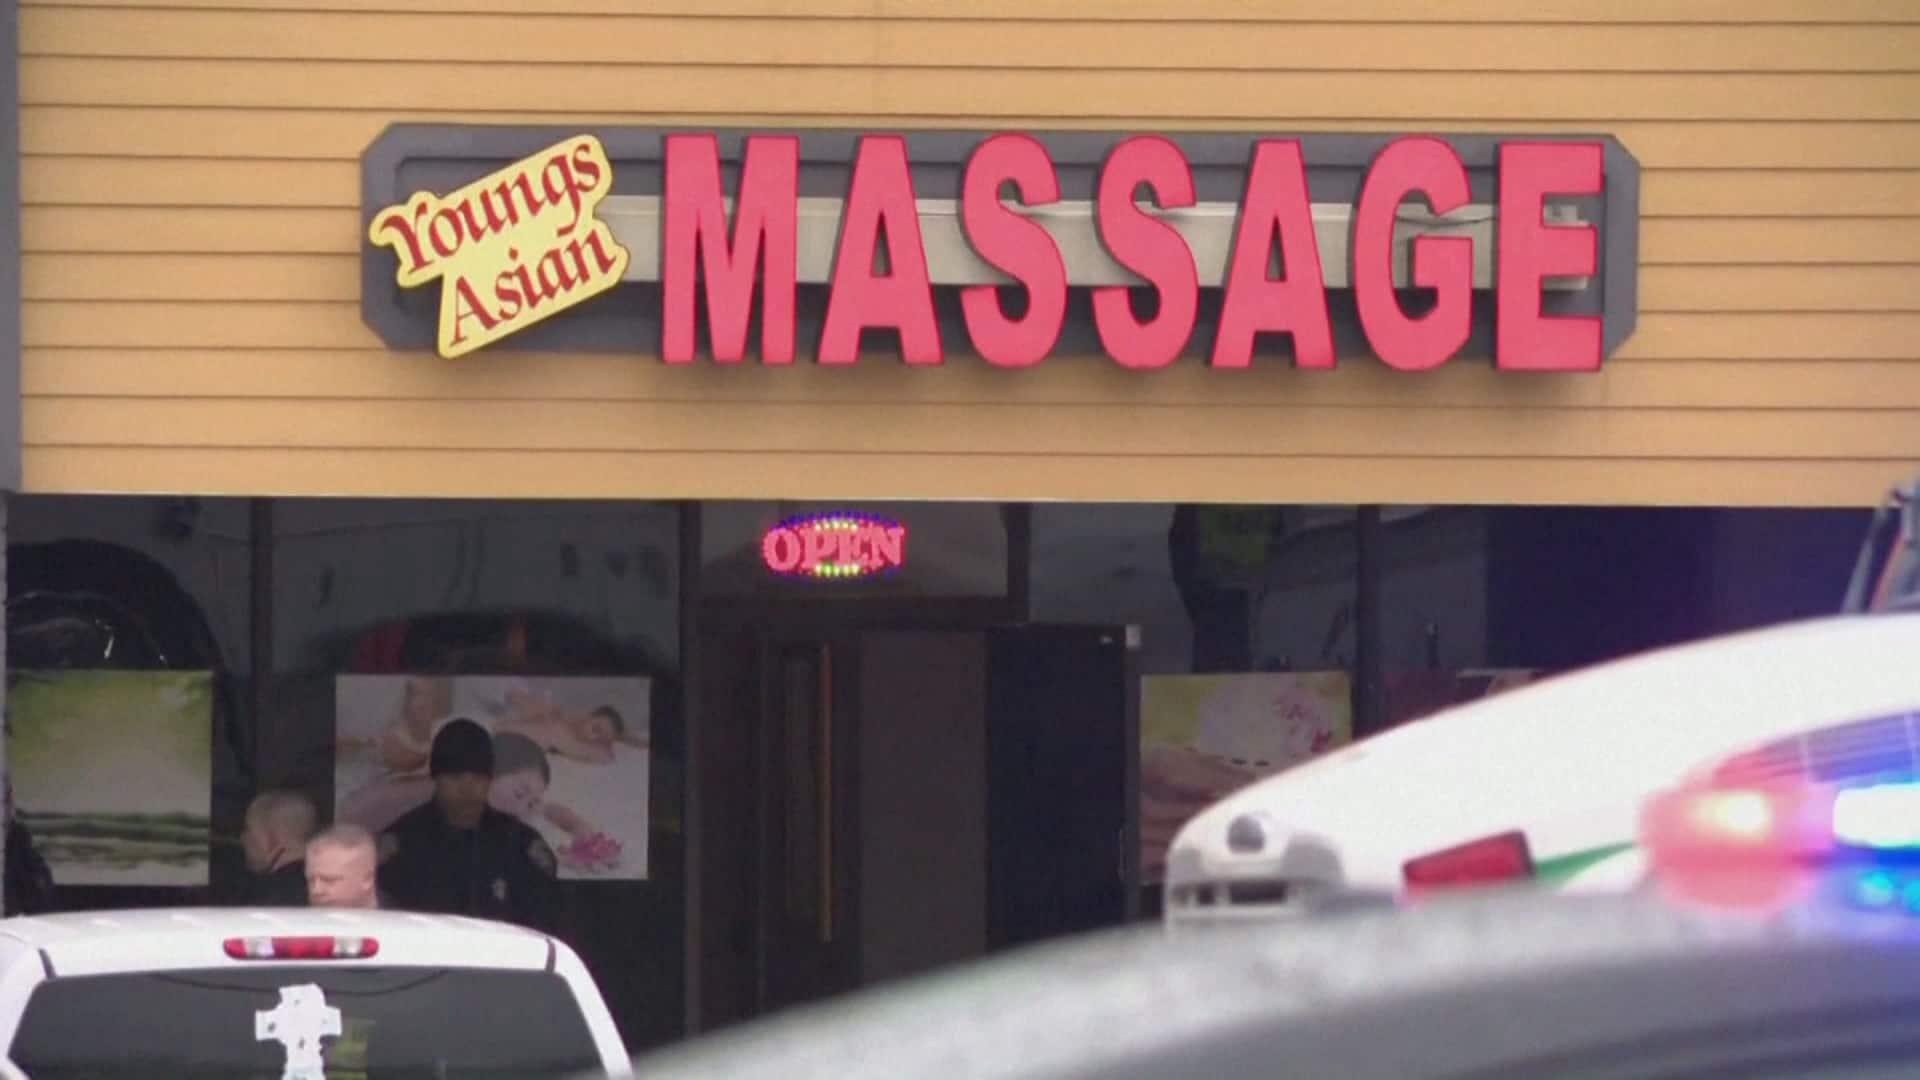 Suspect in Atlanta-area massage parlor shootings may have